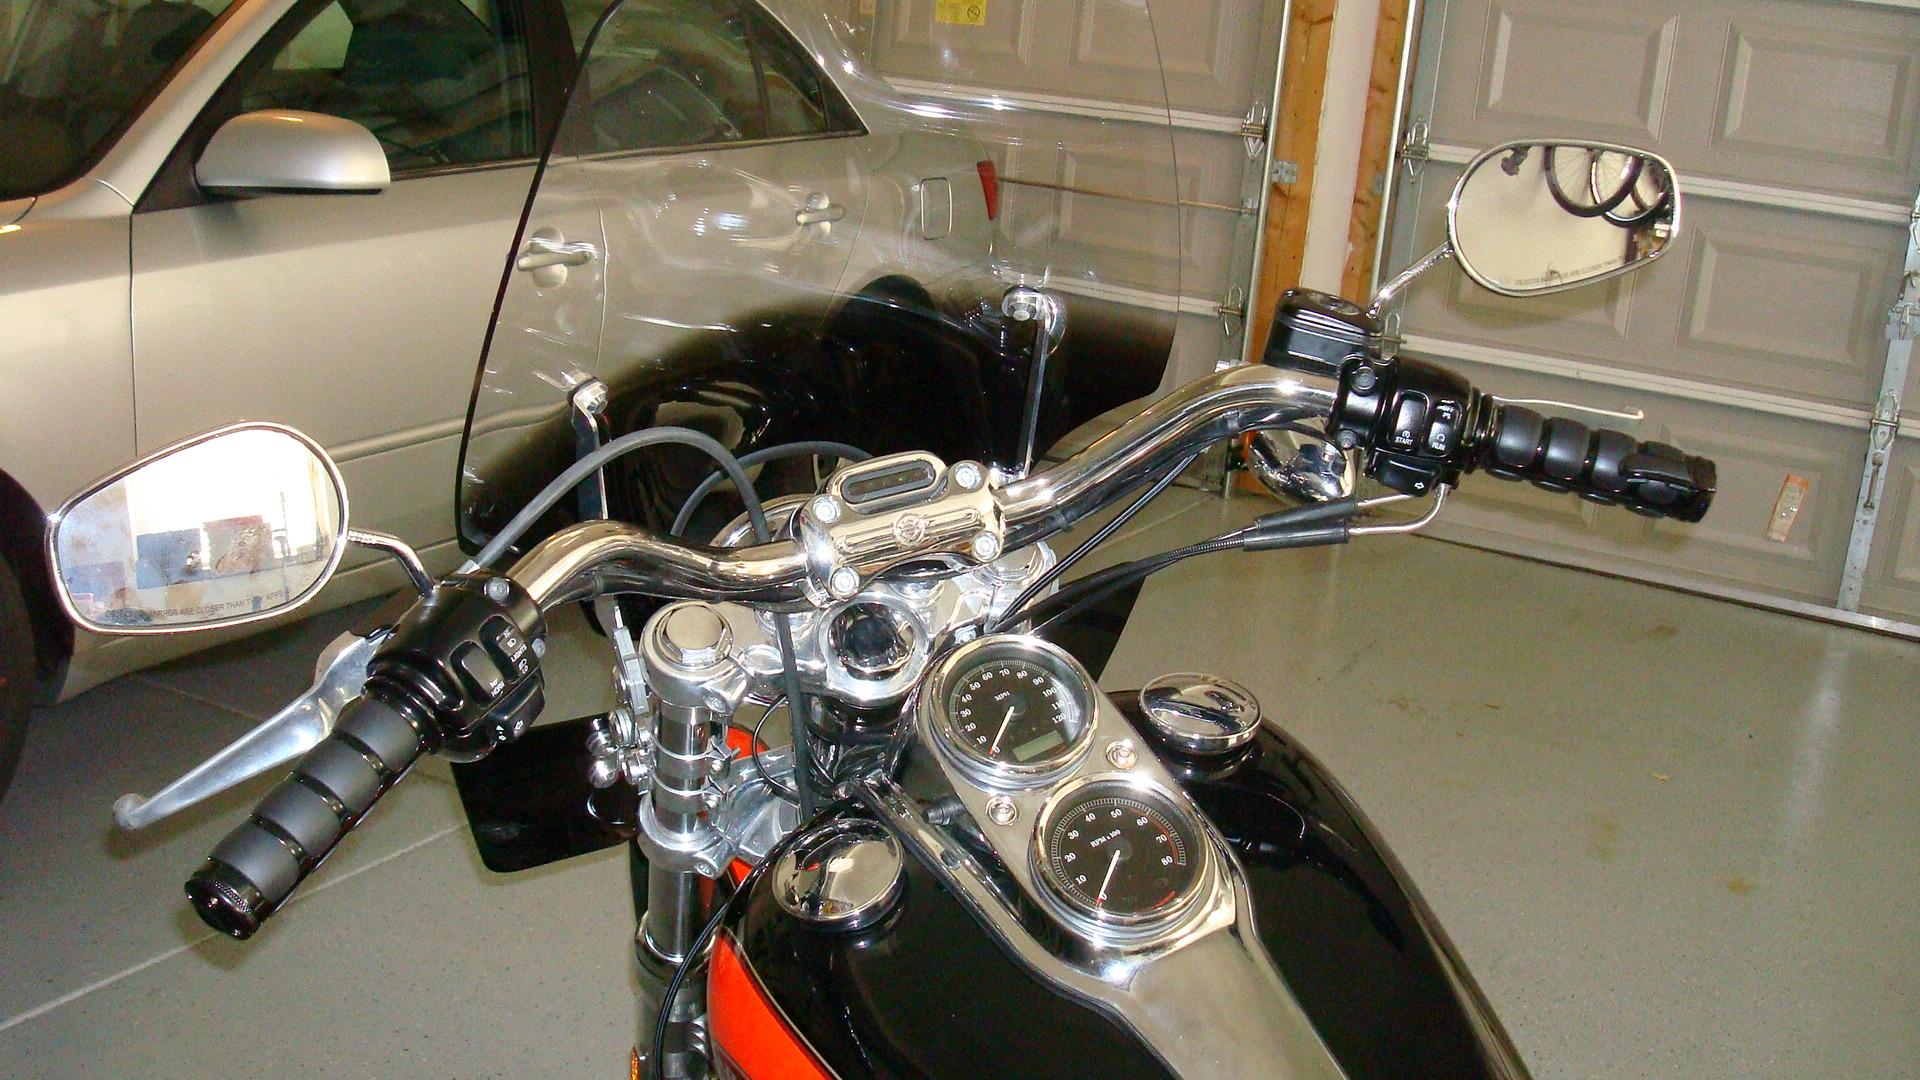 Throttle Idle Cable 1981-1989 Harley Davidson Super Glide FXR NEW